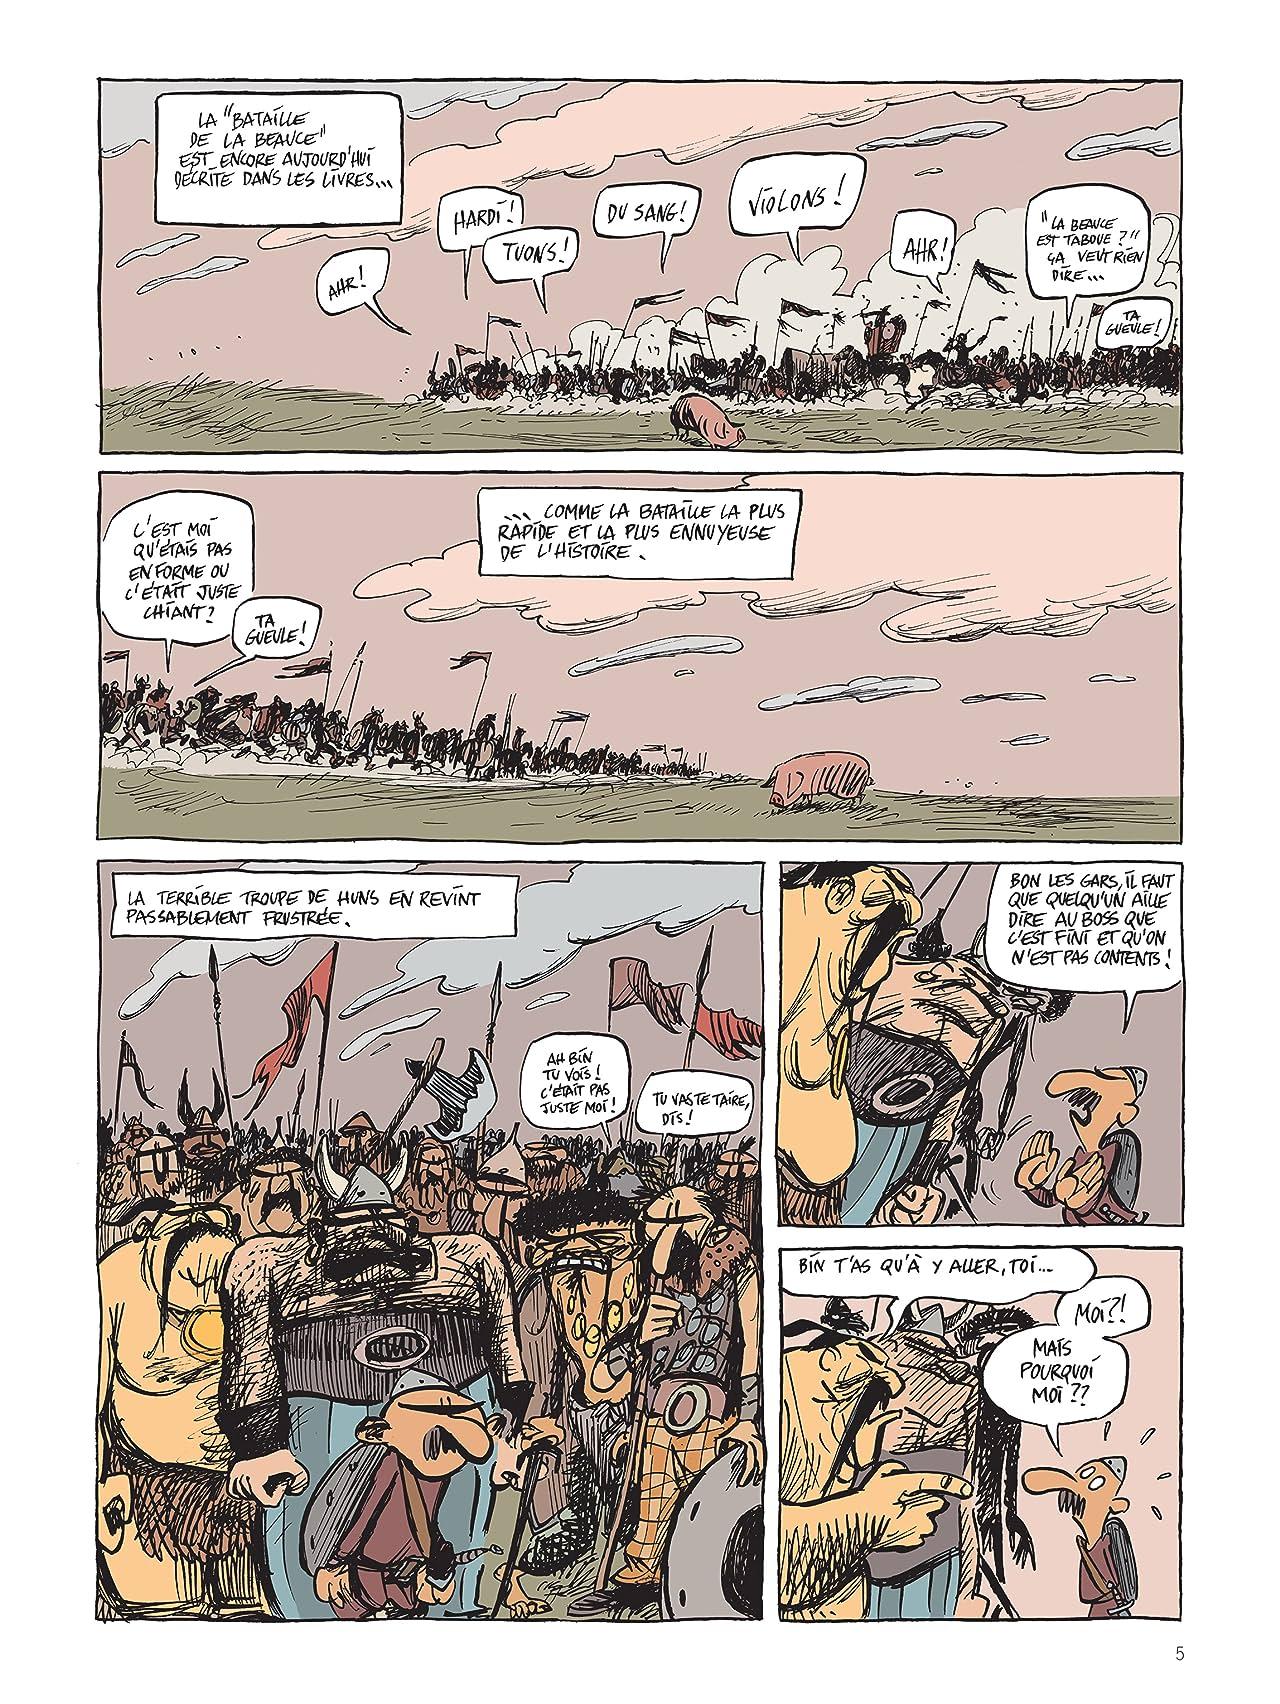 Une aventure rocambolesque de ... Vol. 3: Attila -  Le fléau de Dieu